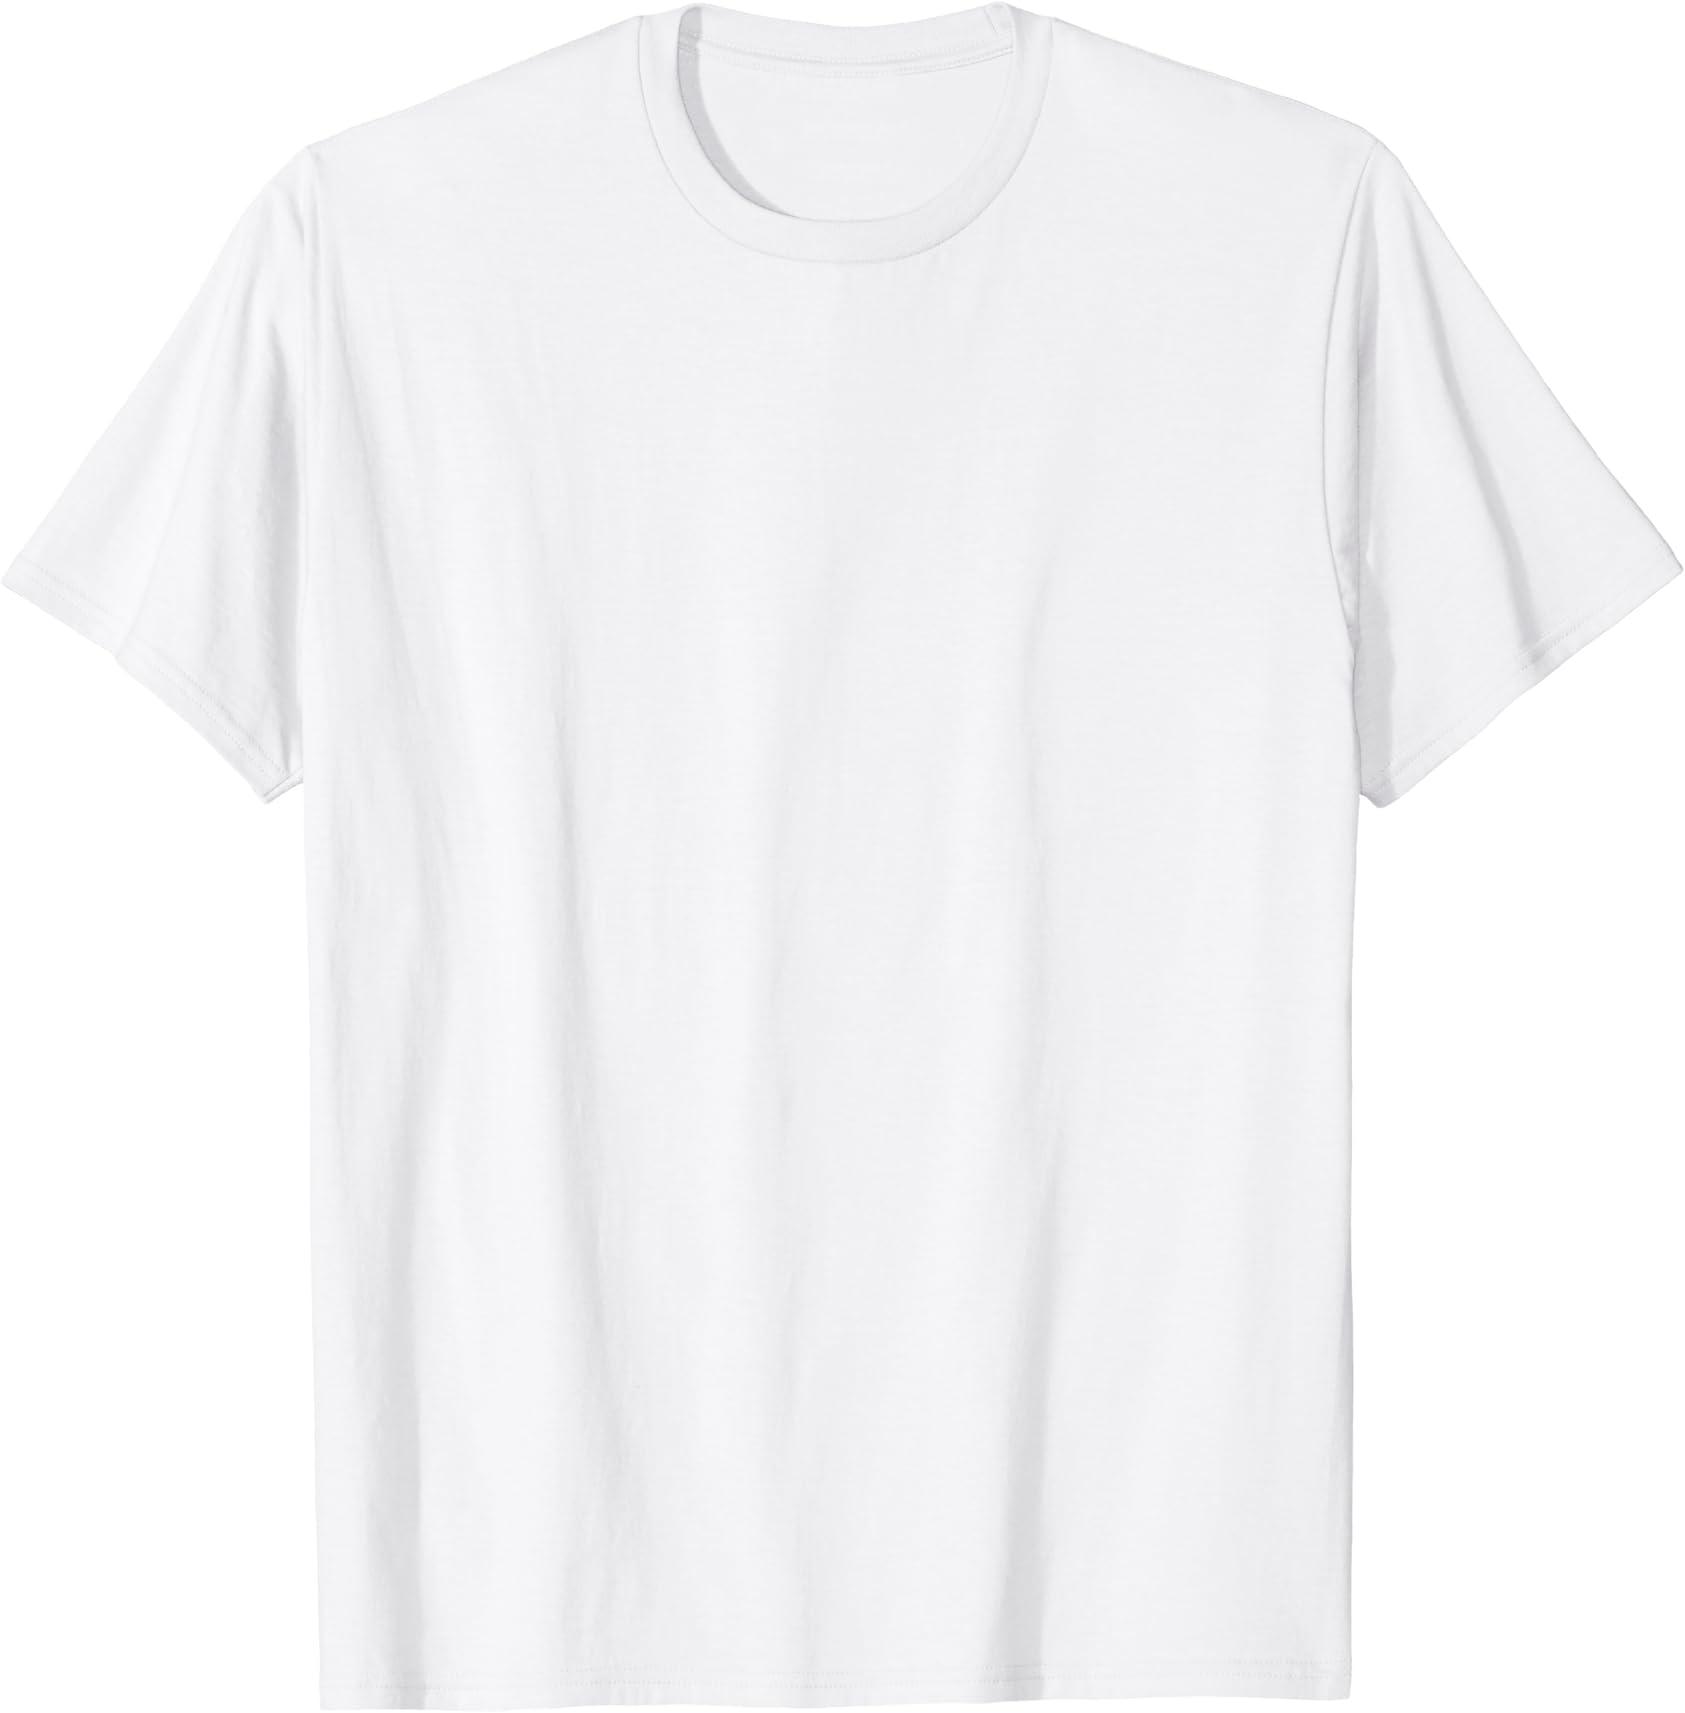 Bless Your Heart Arrow Letter Print Shirt Women Casual Short Sleeve Tshirt Tops Tee